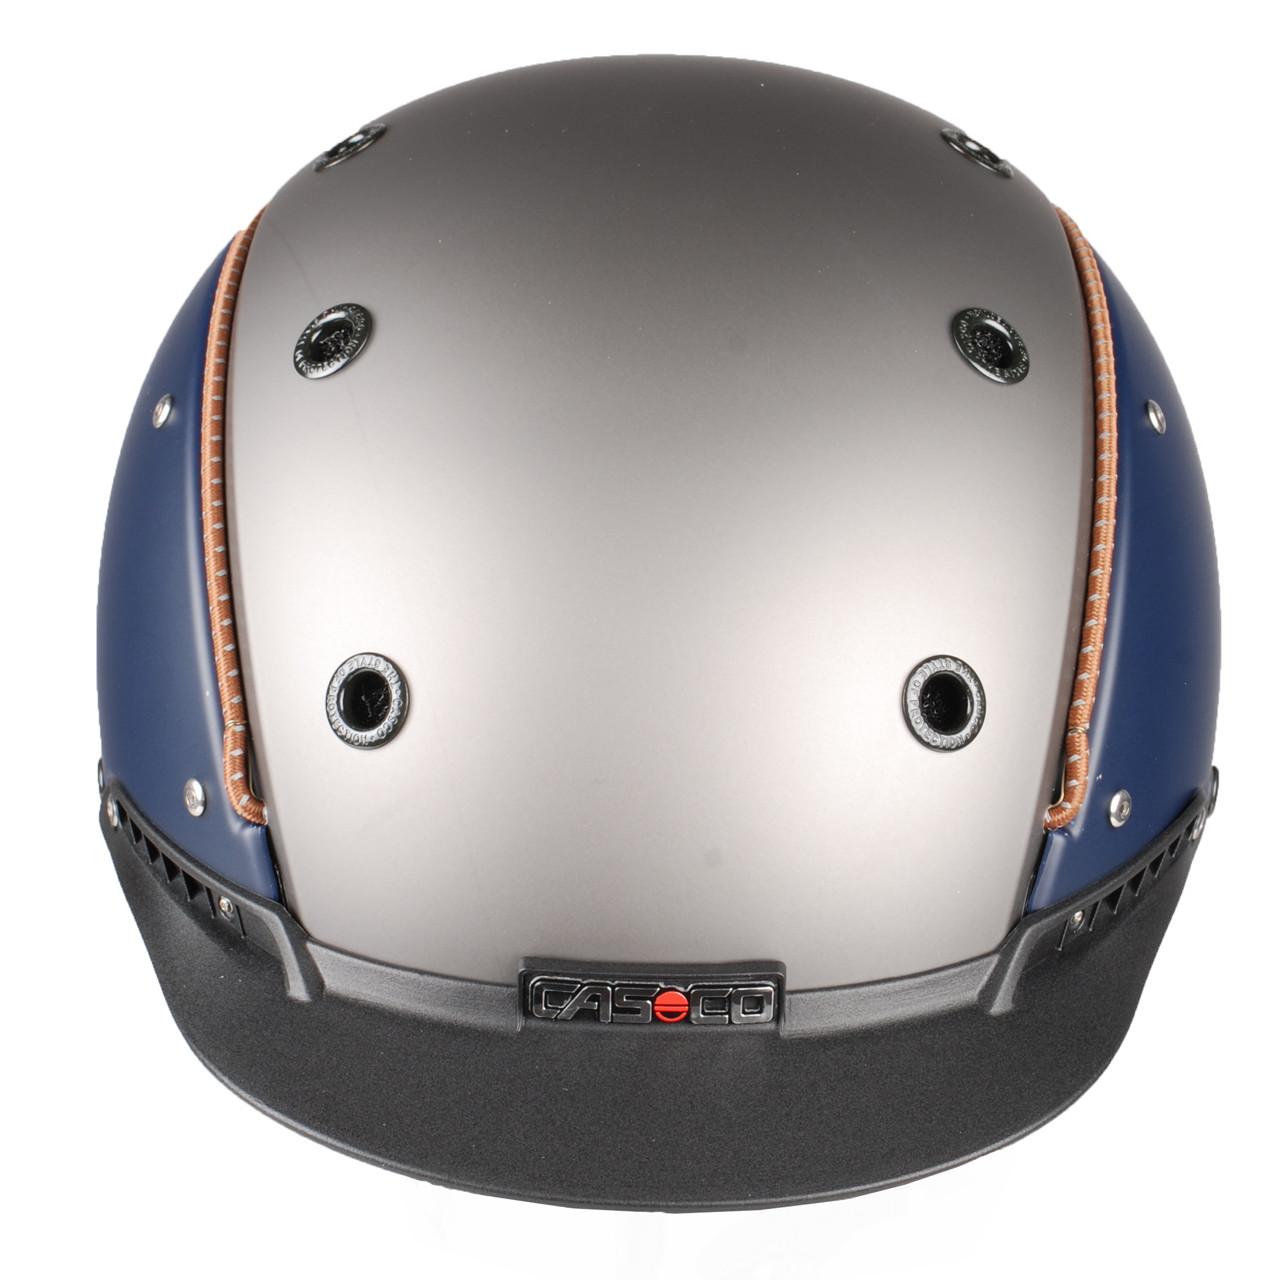 Casco Champ-3 cap zwart maat:s